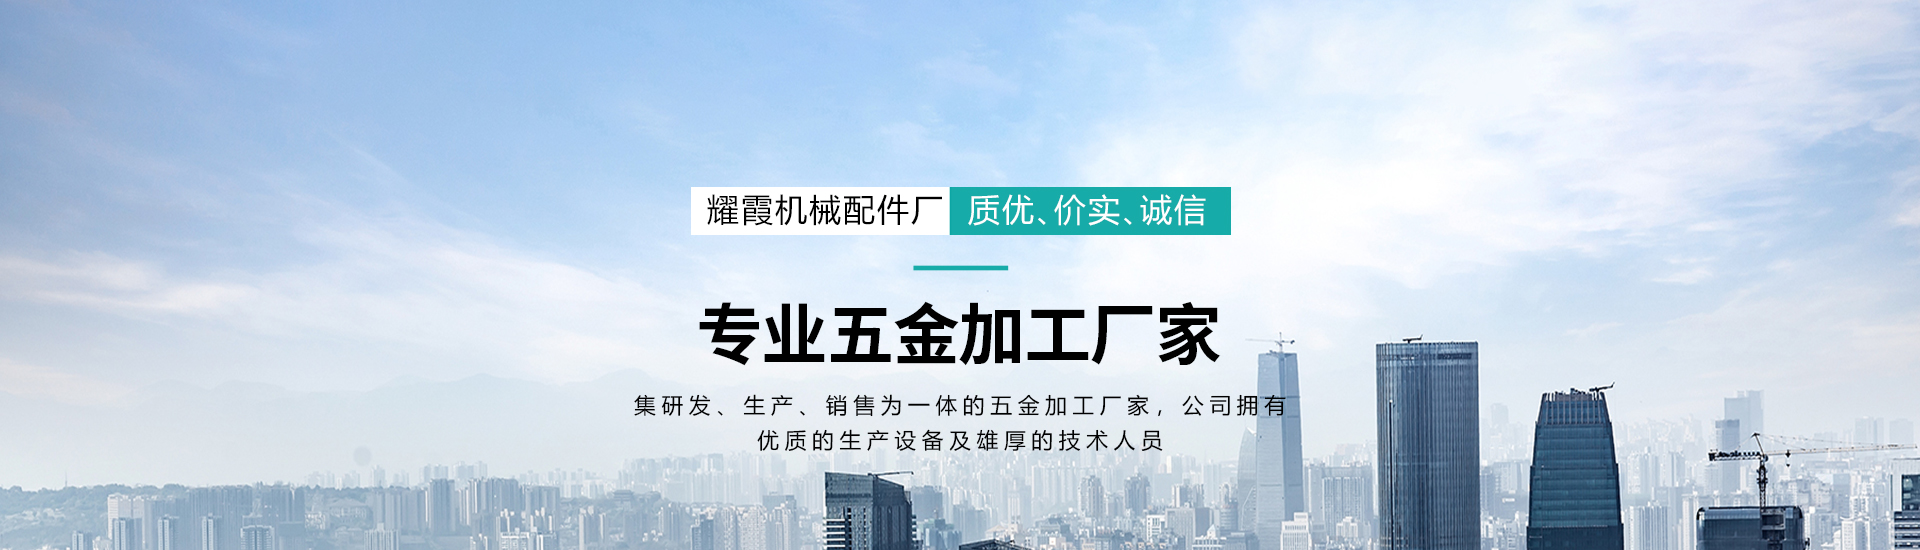 http://www.nbyaoxia.com/data/upload/202009/20200914155726_877.jpg